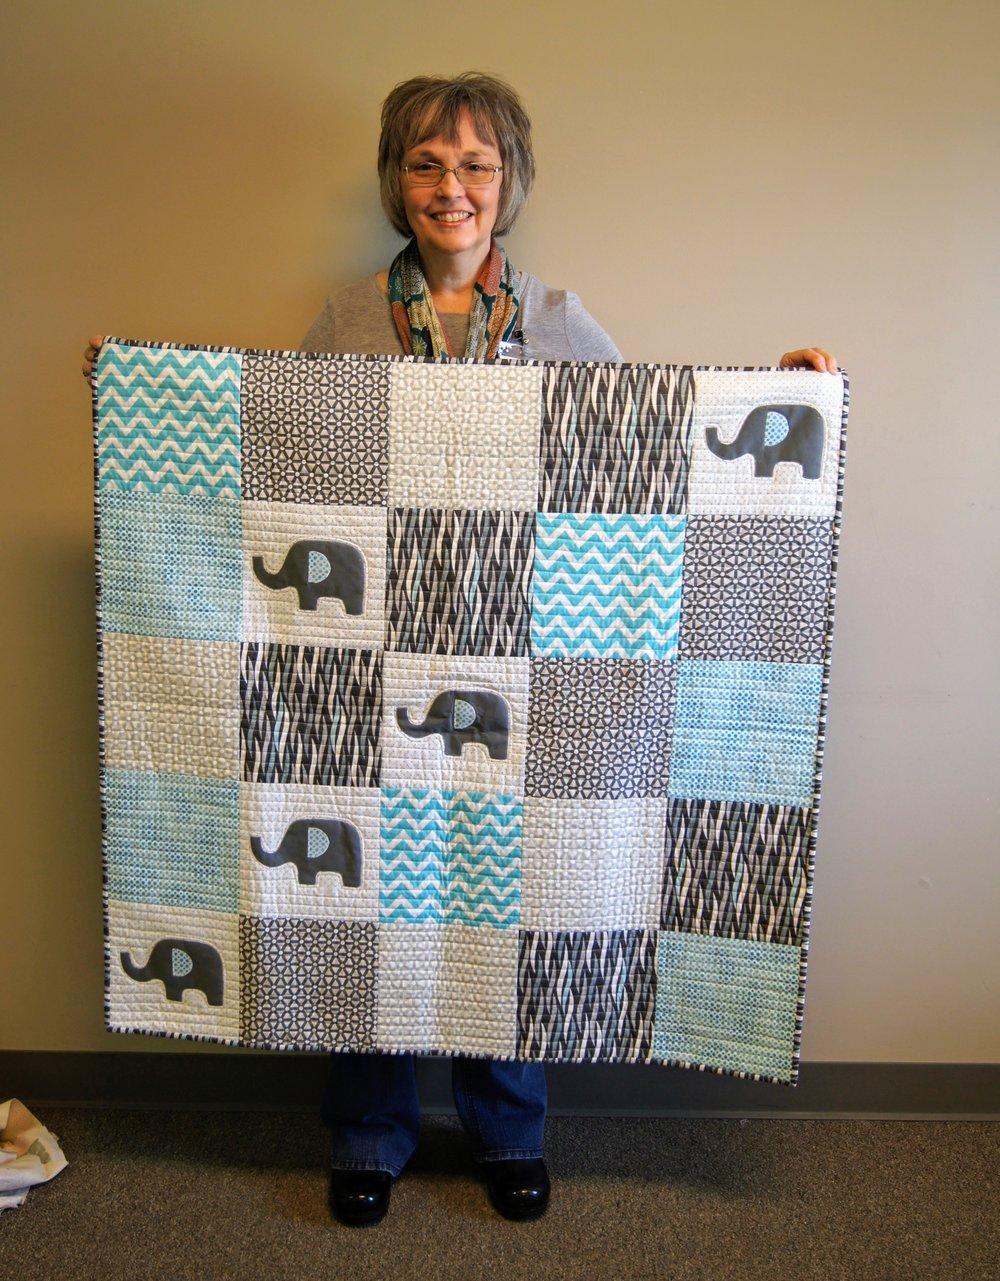 Patricia Steadman's adorable elephants